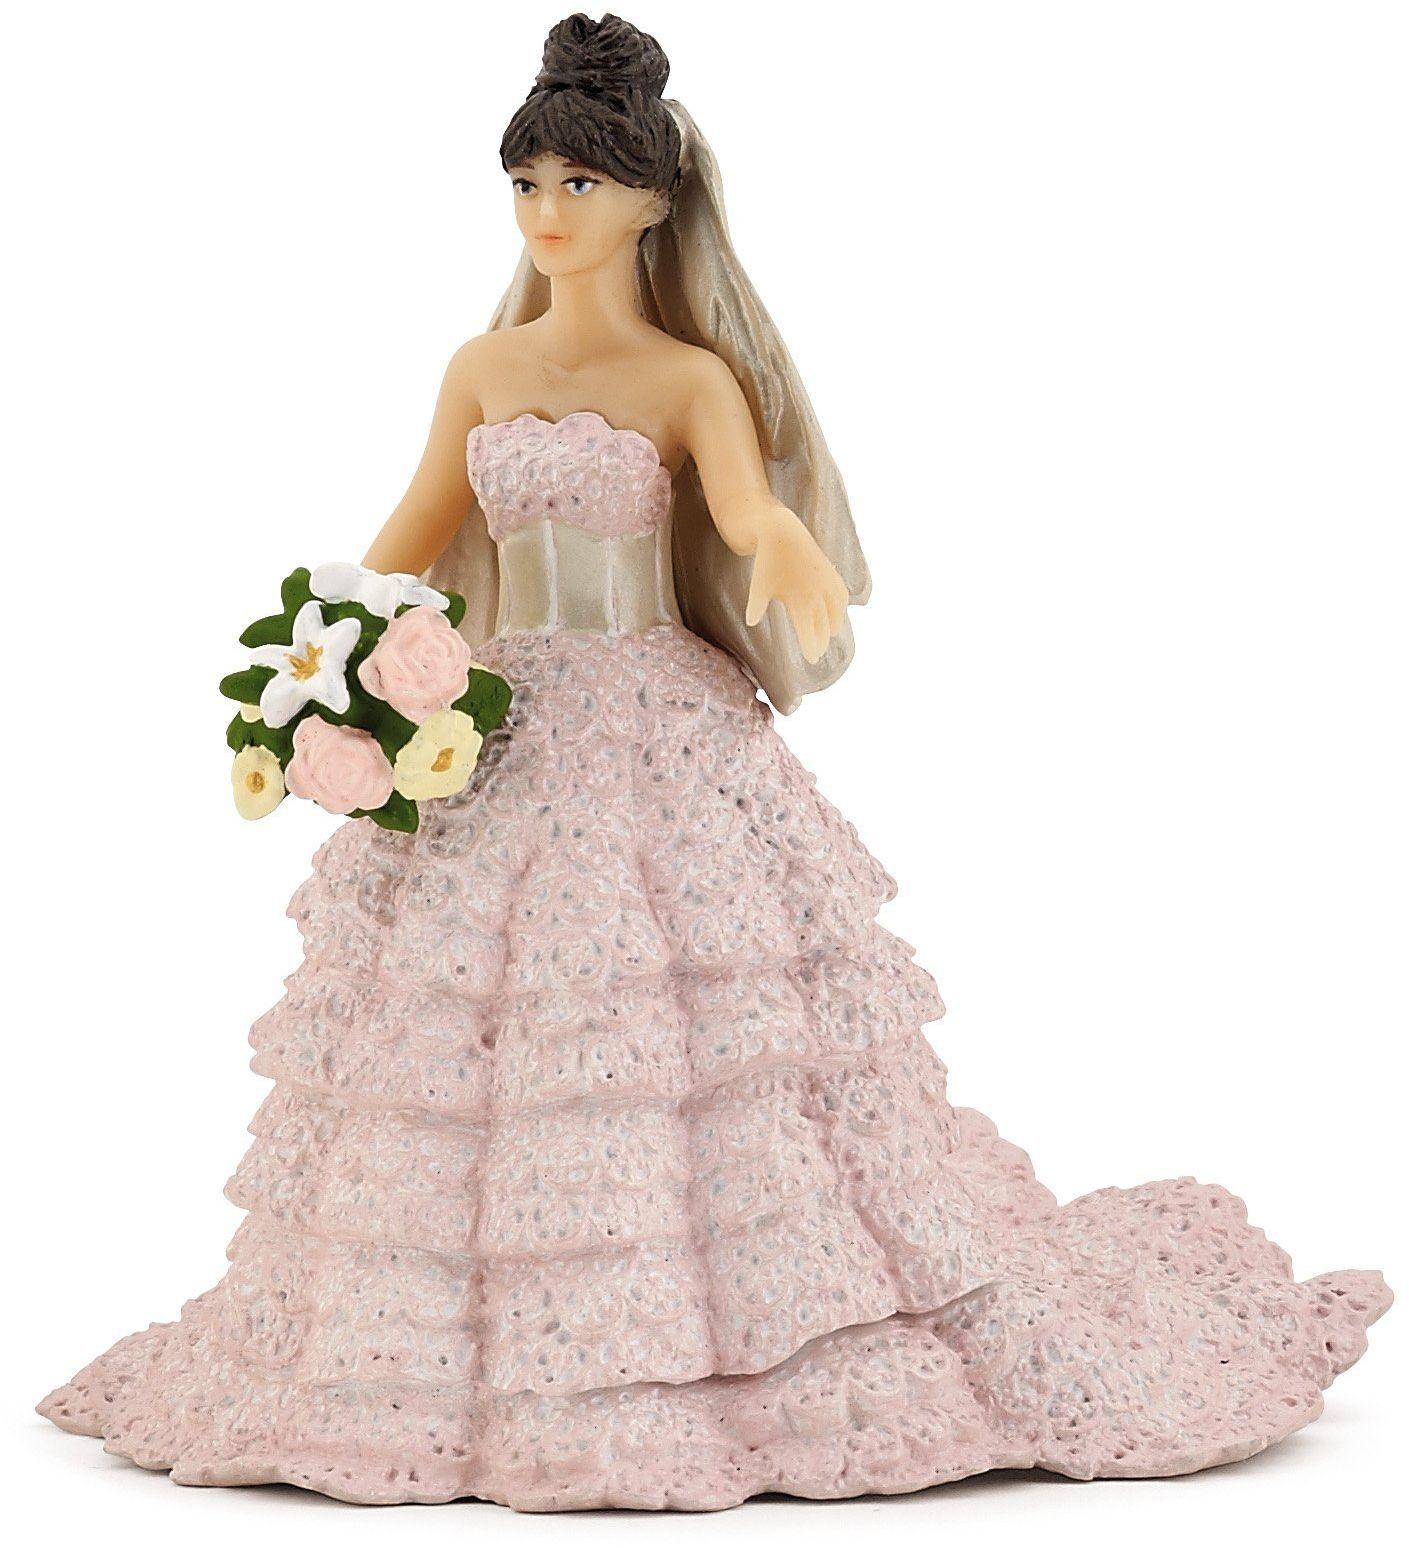 Papo Różowa koronka panna młoda